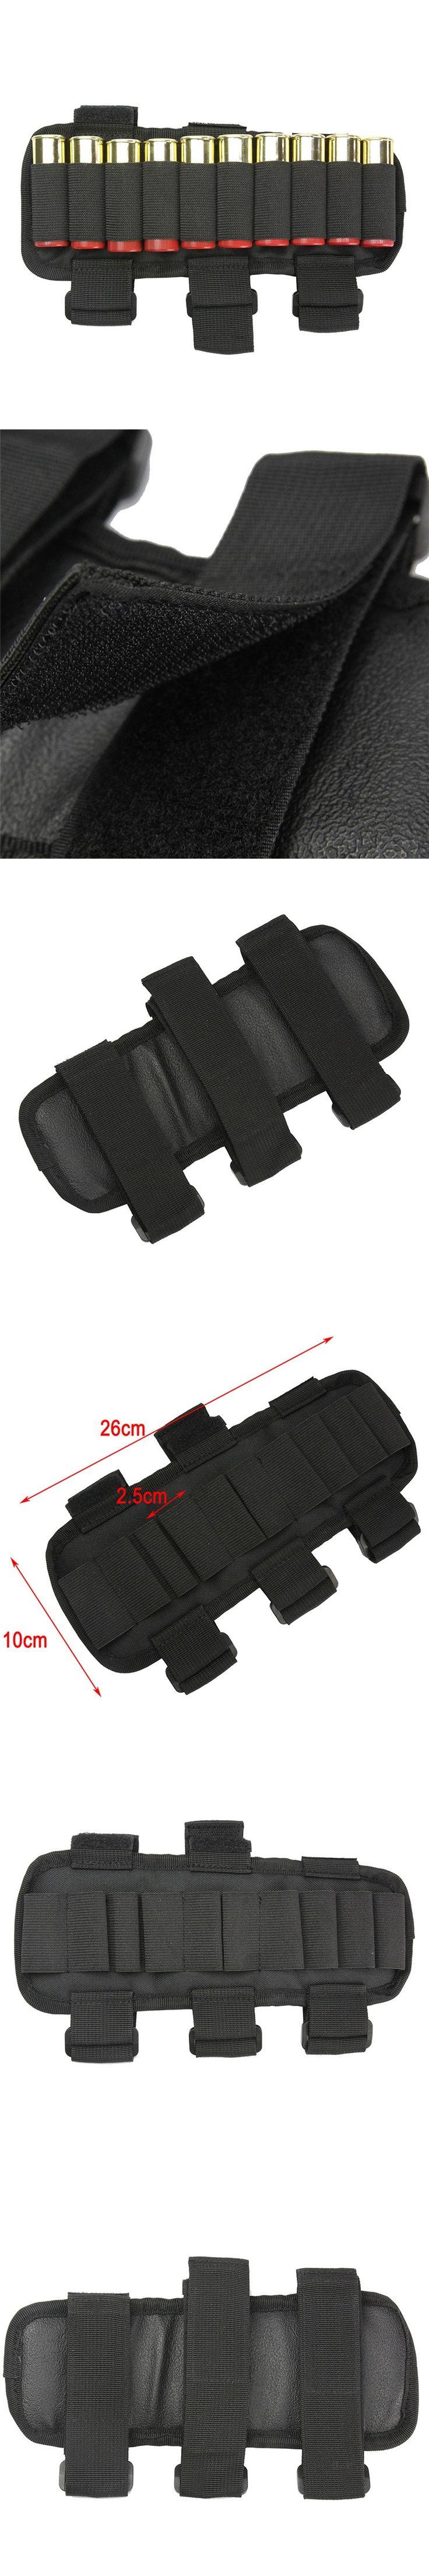 10 Round Shotgun Shotshell Reload Holder Molle Pouch for 12 Gauge/20GA Cartridge Hunting Stock Buttstock Carrier Holder